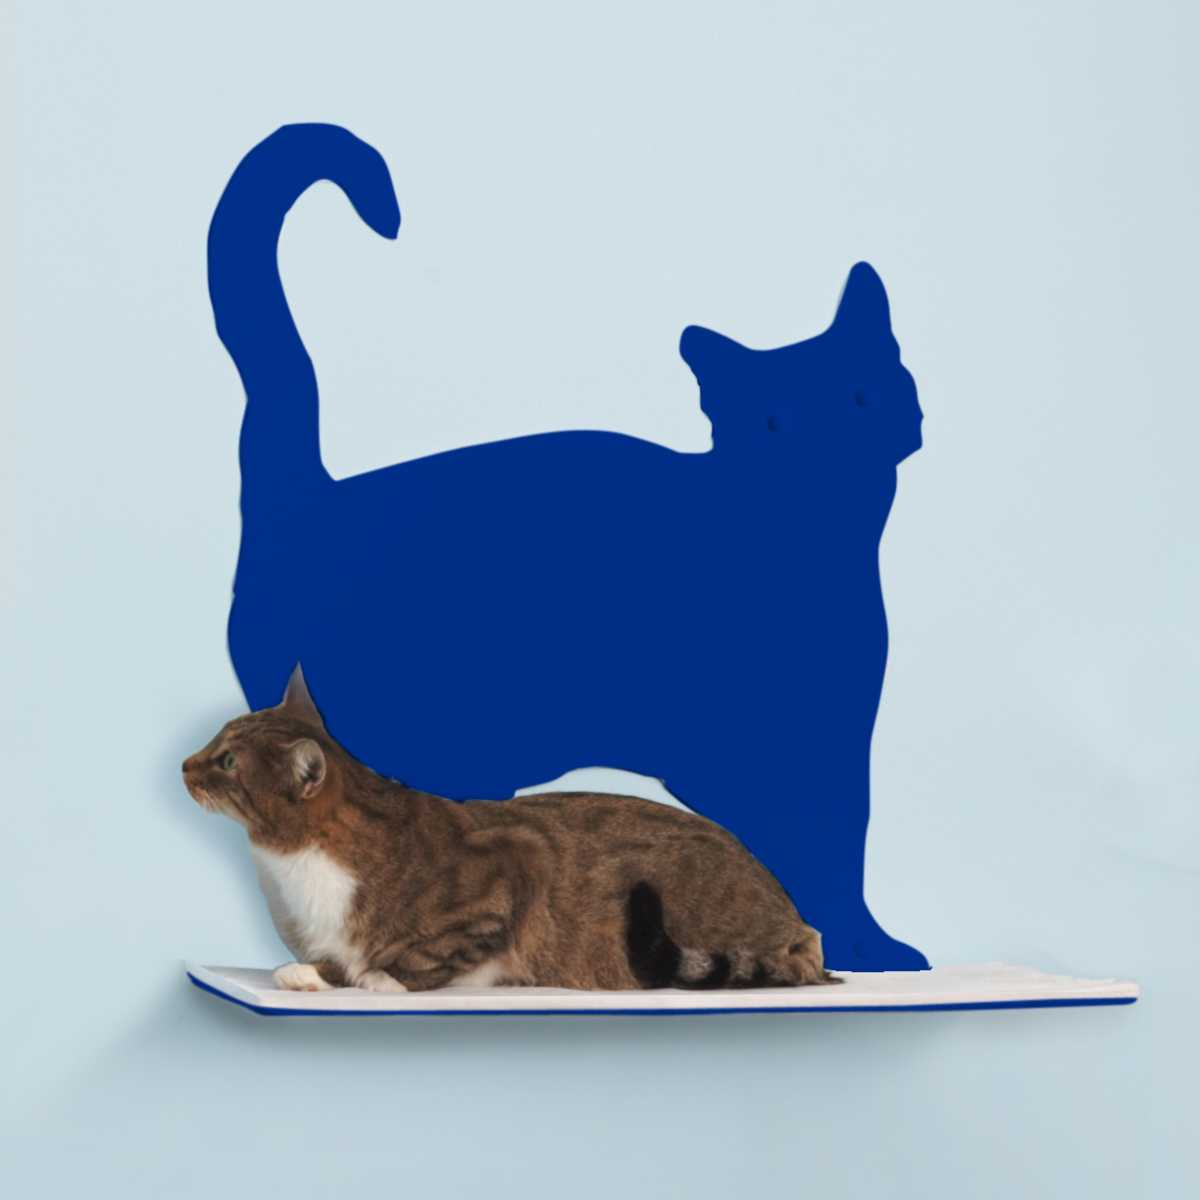 Cat Silhouette Cat Shelf Prance Catsplay Superstore